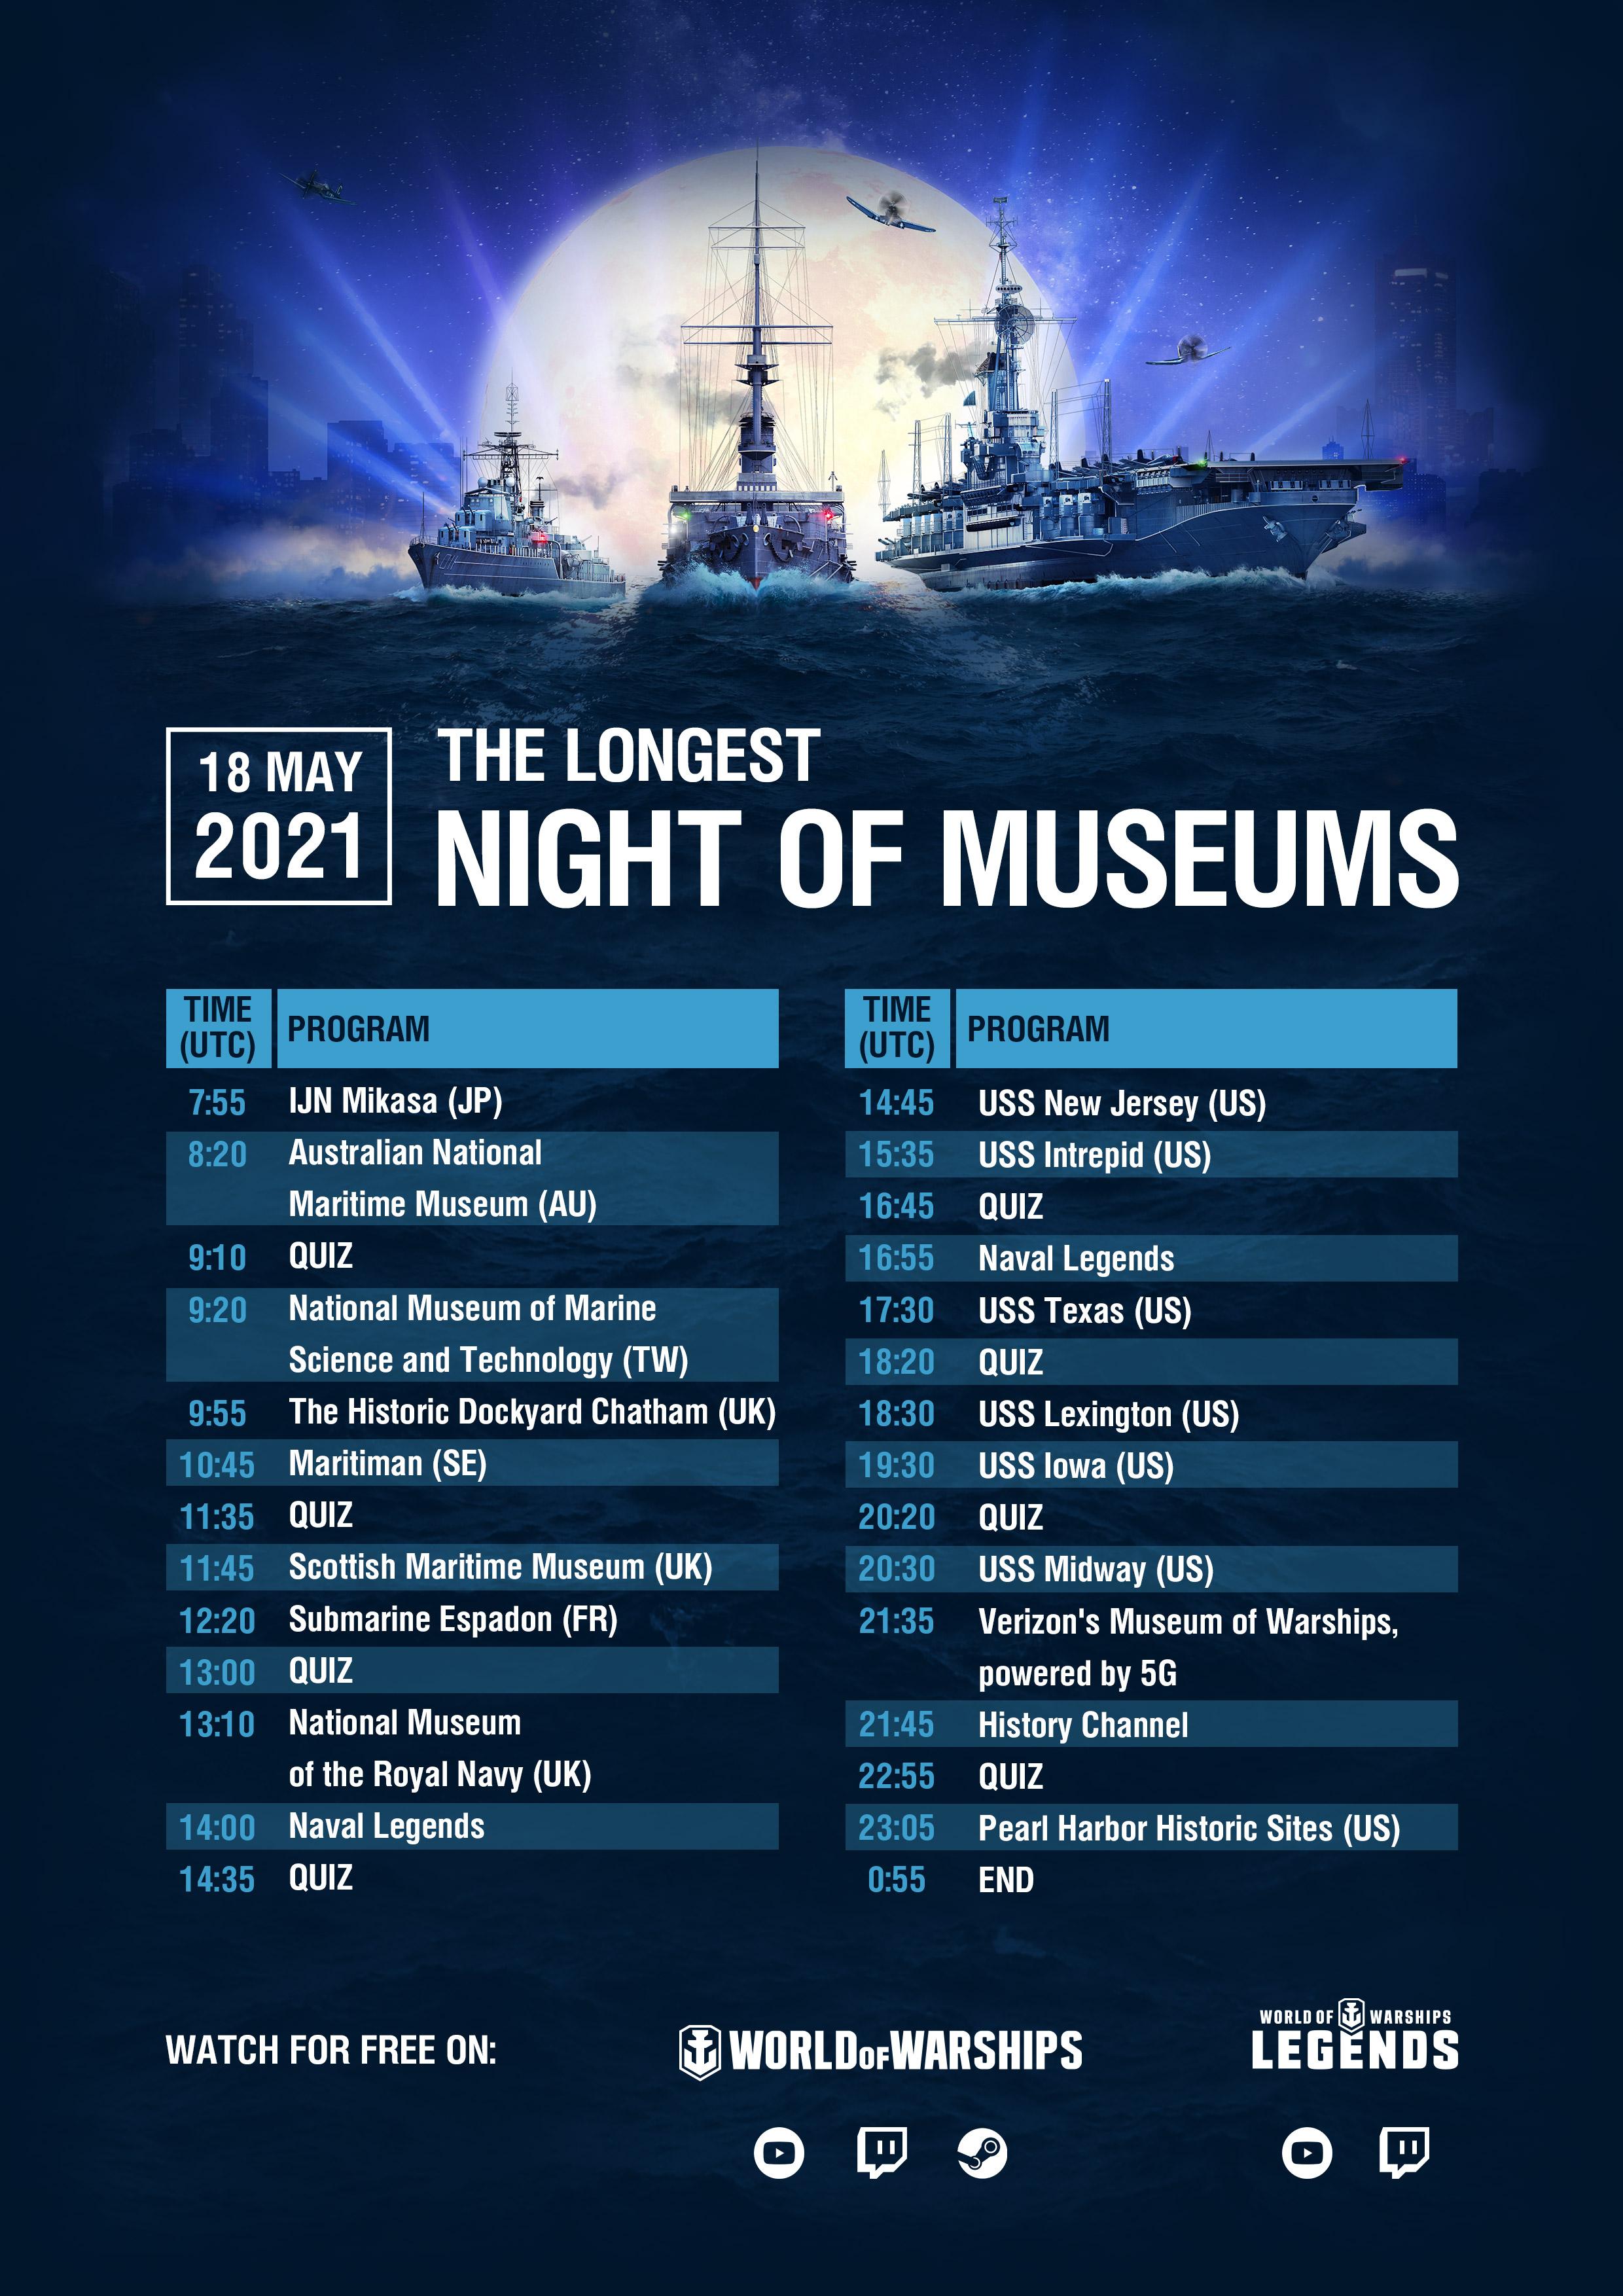 Long night of museums